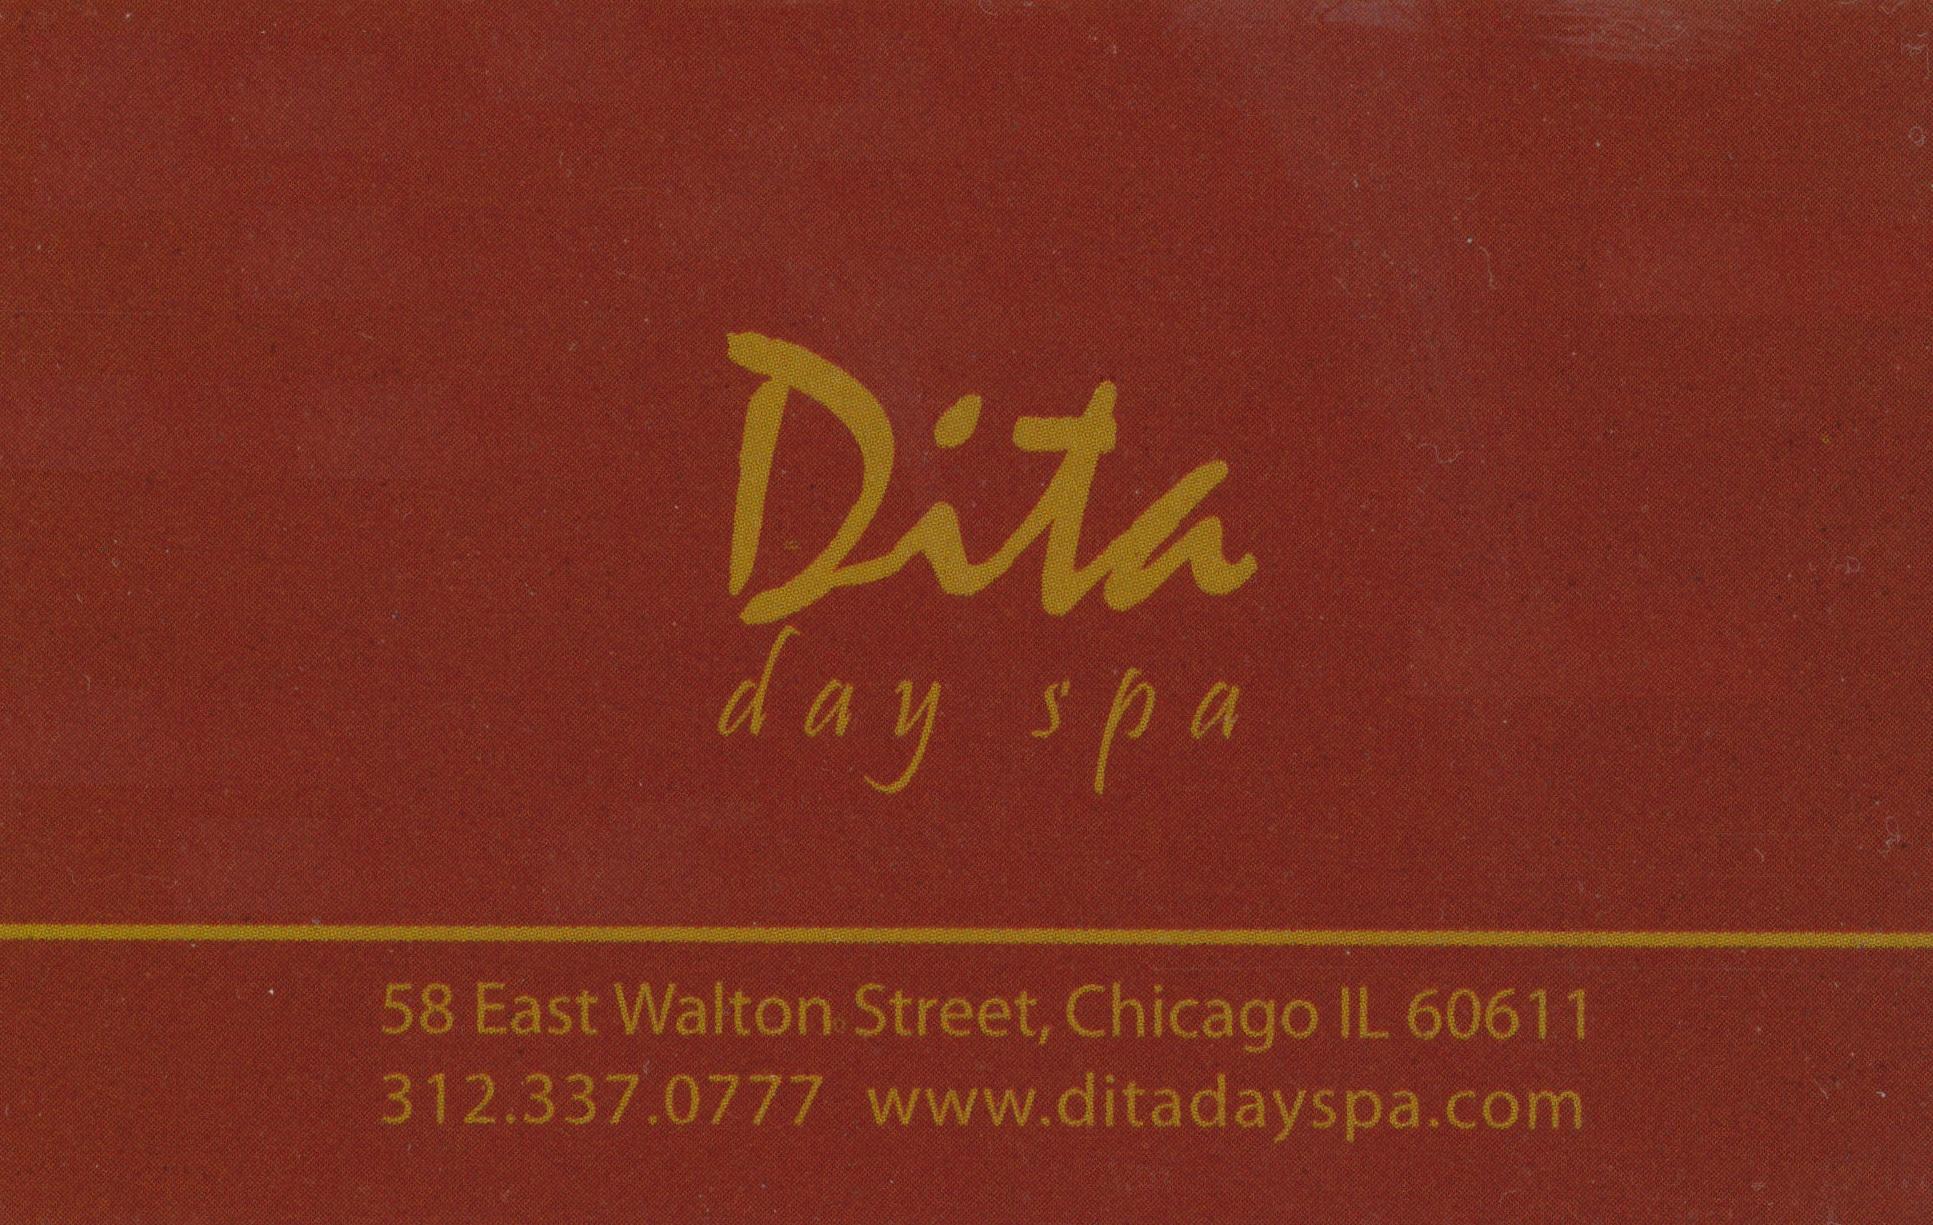 Dita Day Spa